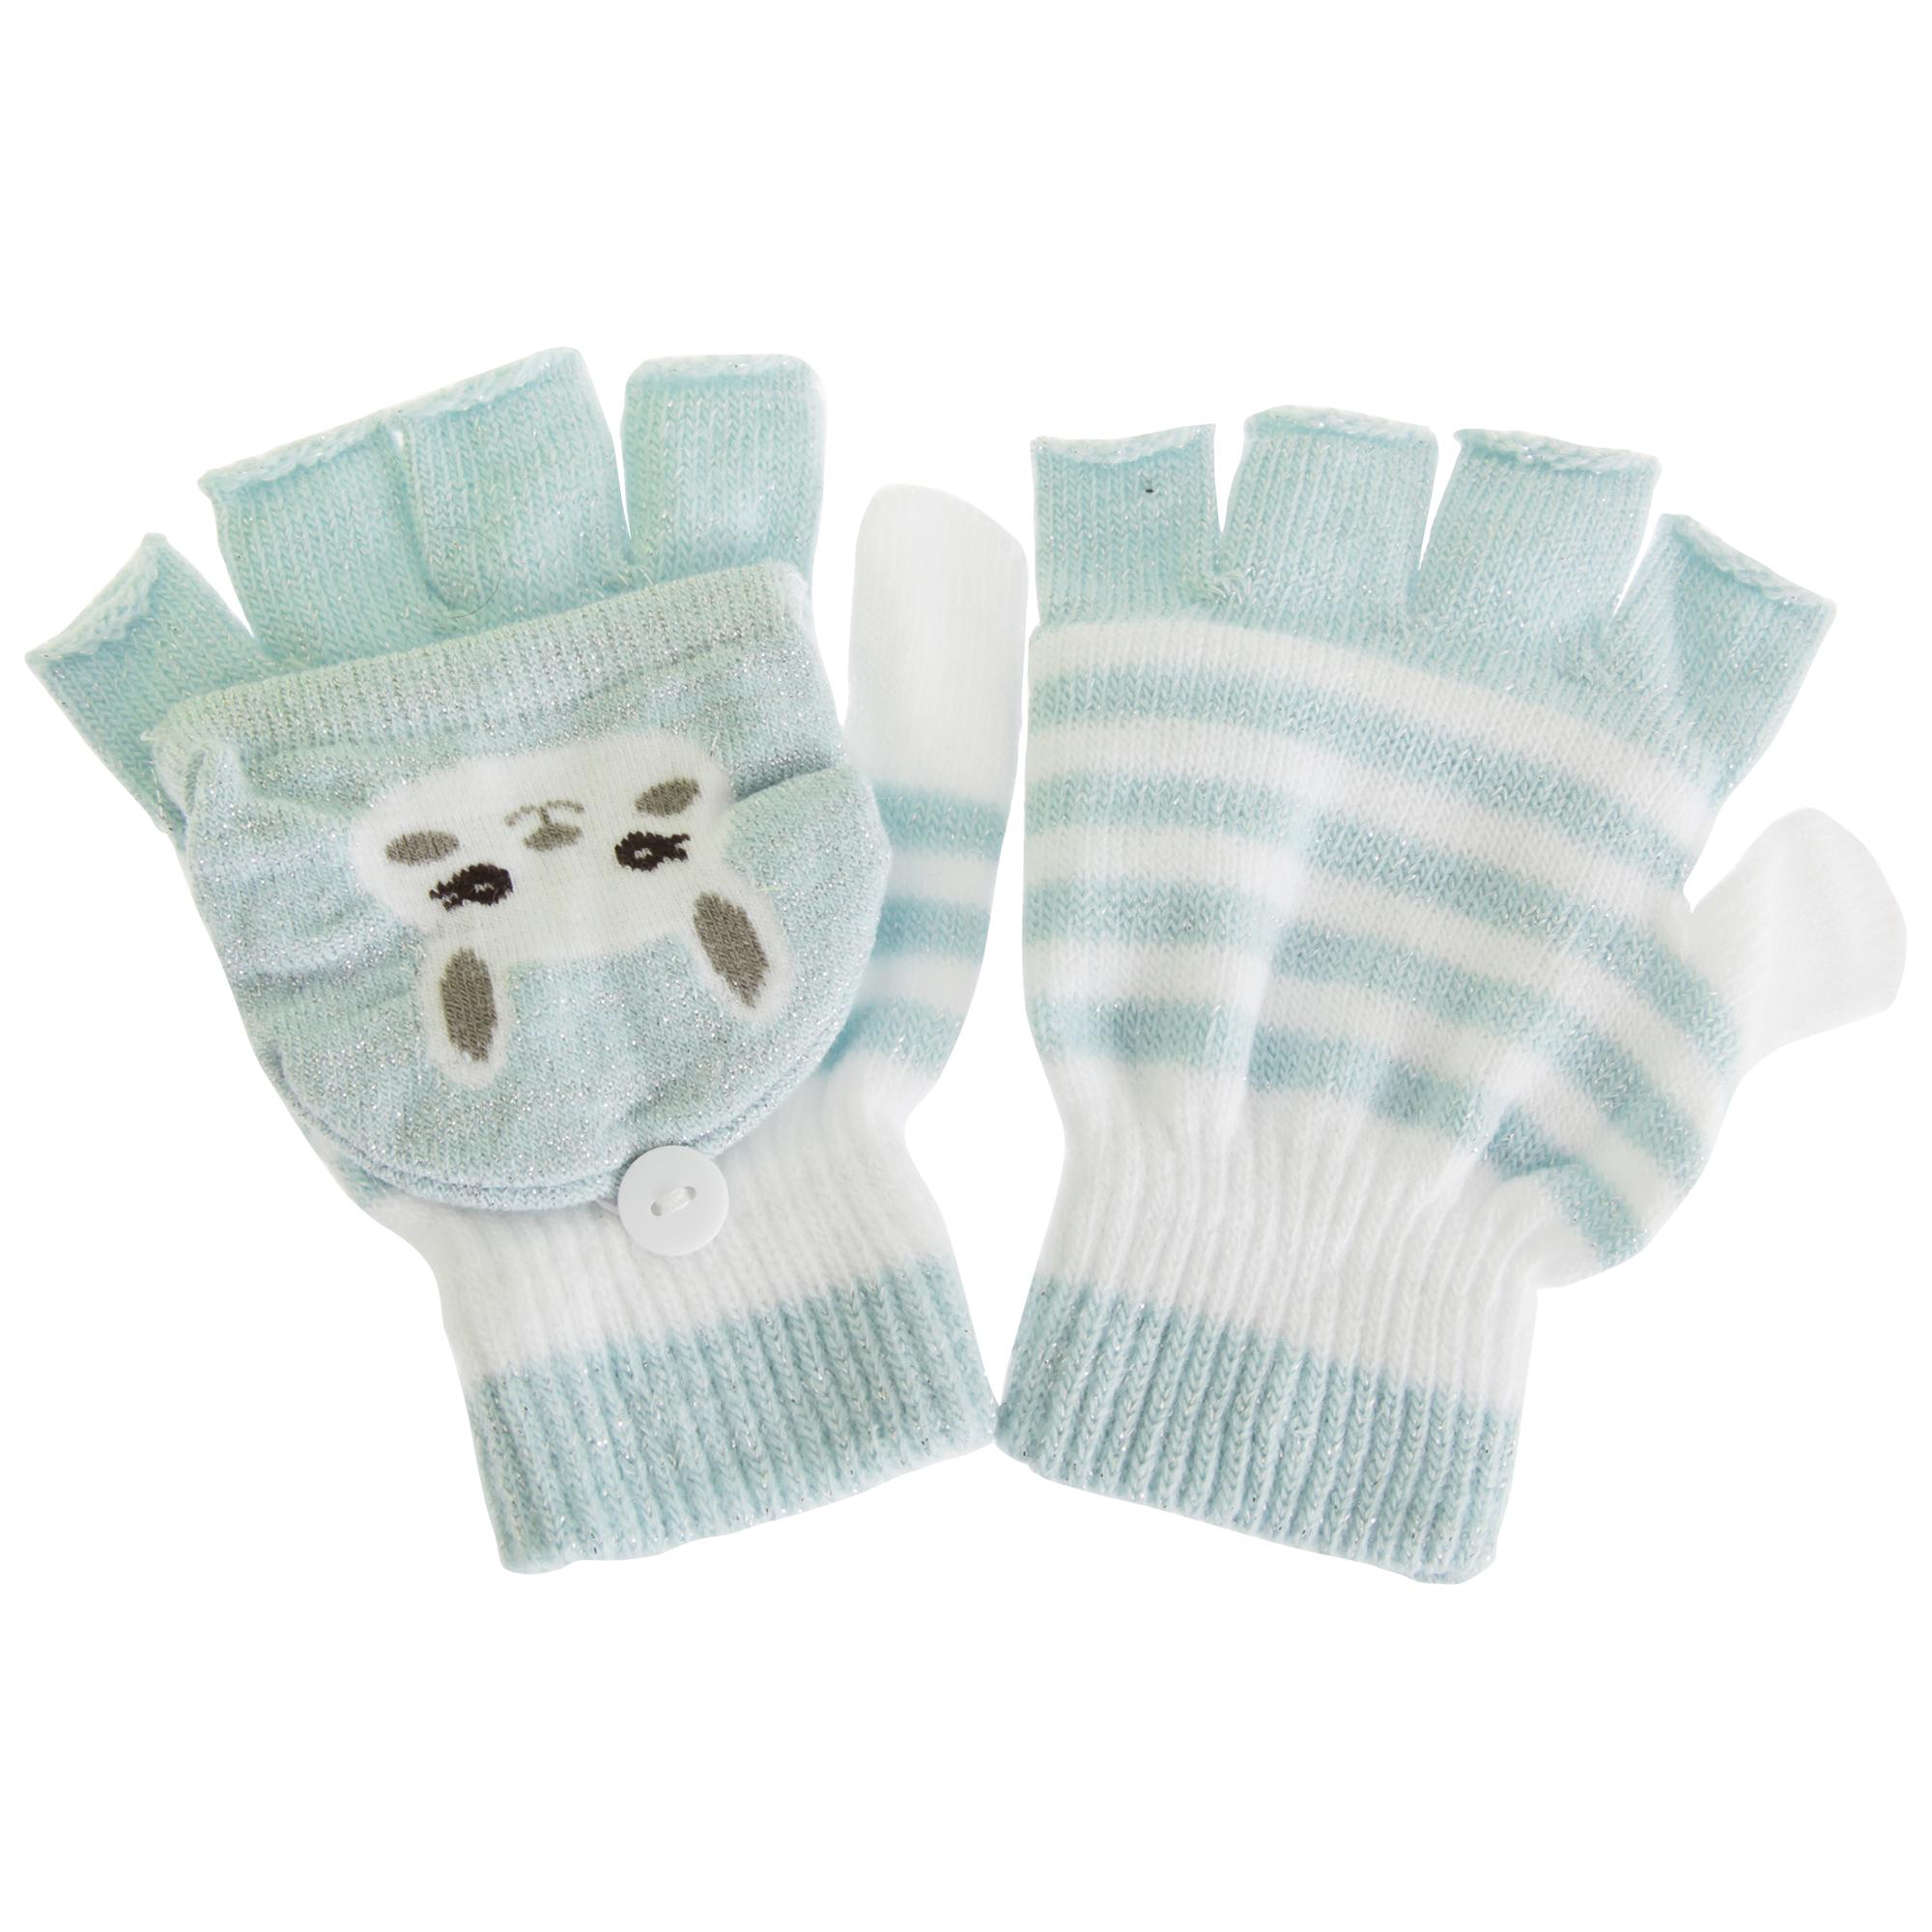 1 Pair Childrens//Kids Cat Striped Gloves//Mittens With Glitter GL597